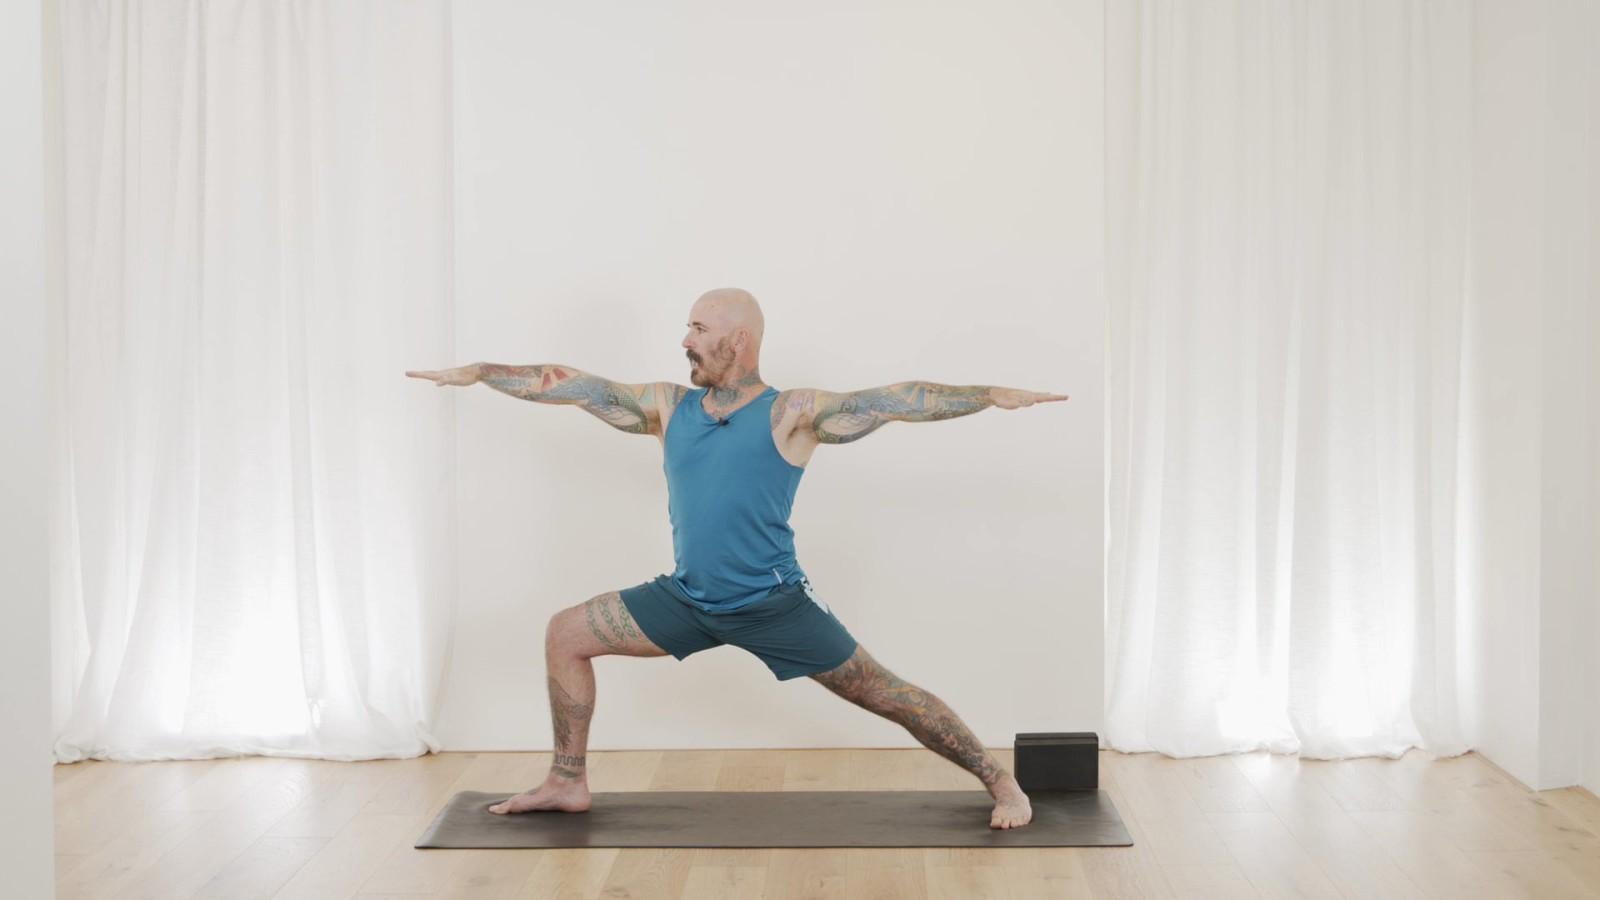 Yoga Foundations - Warrior 1 & 2 with Ari Levanael